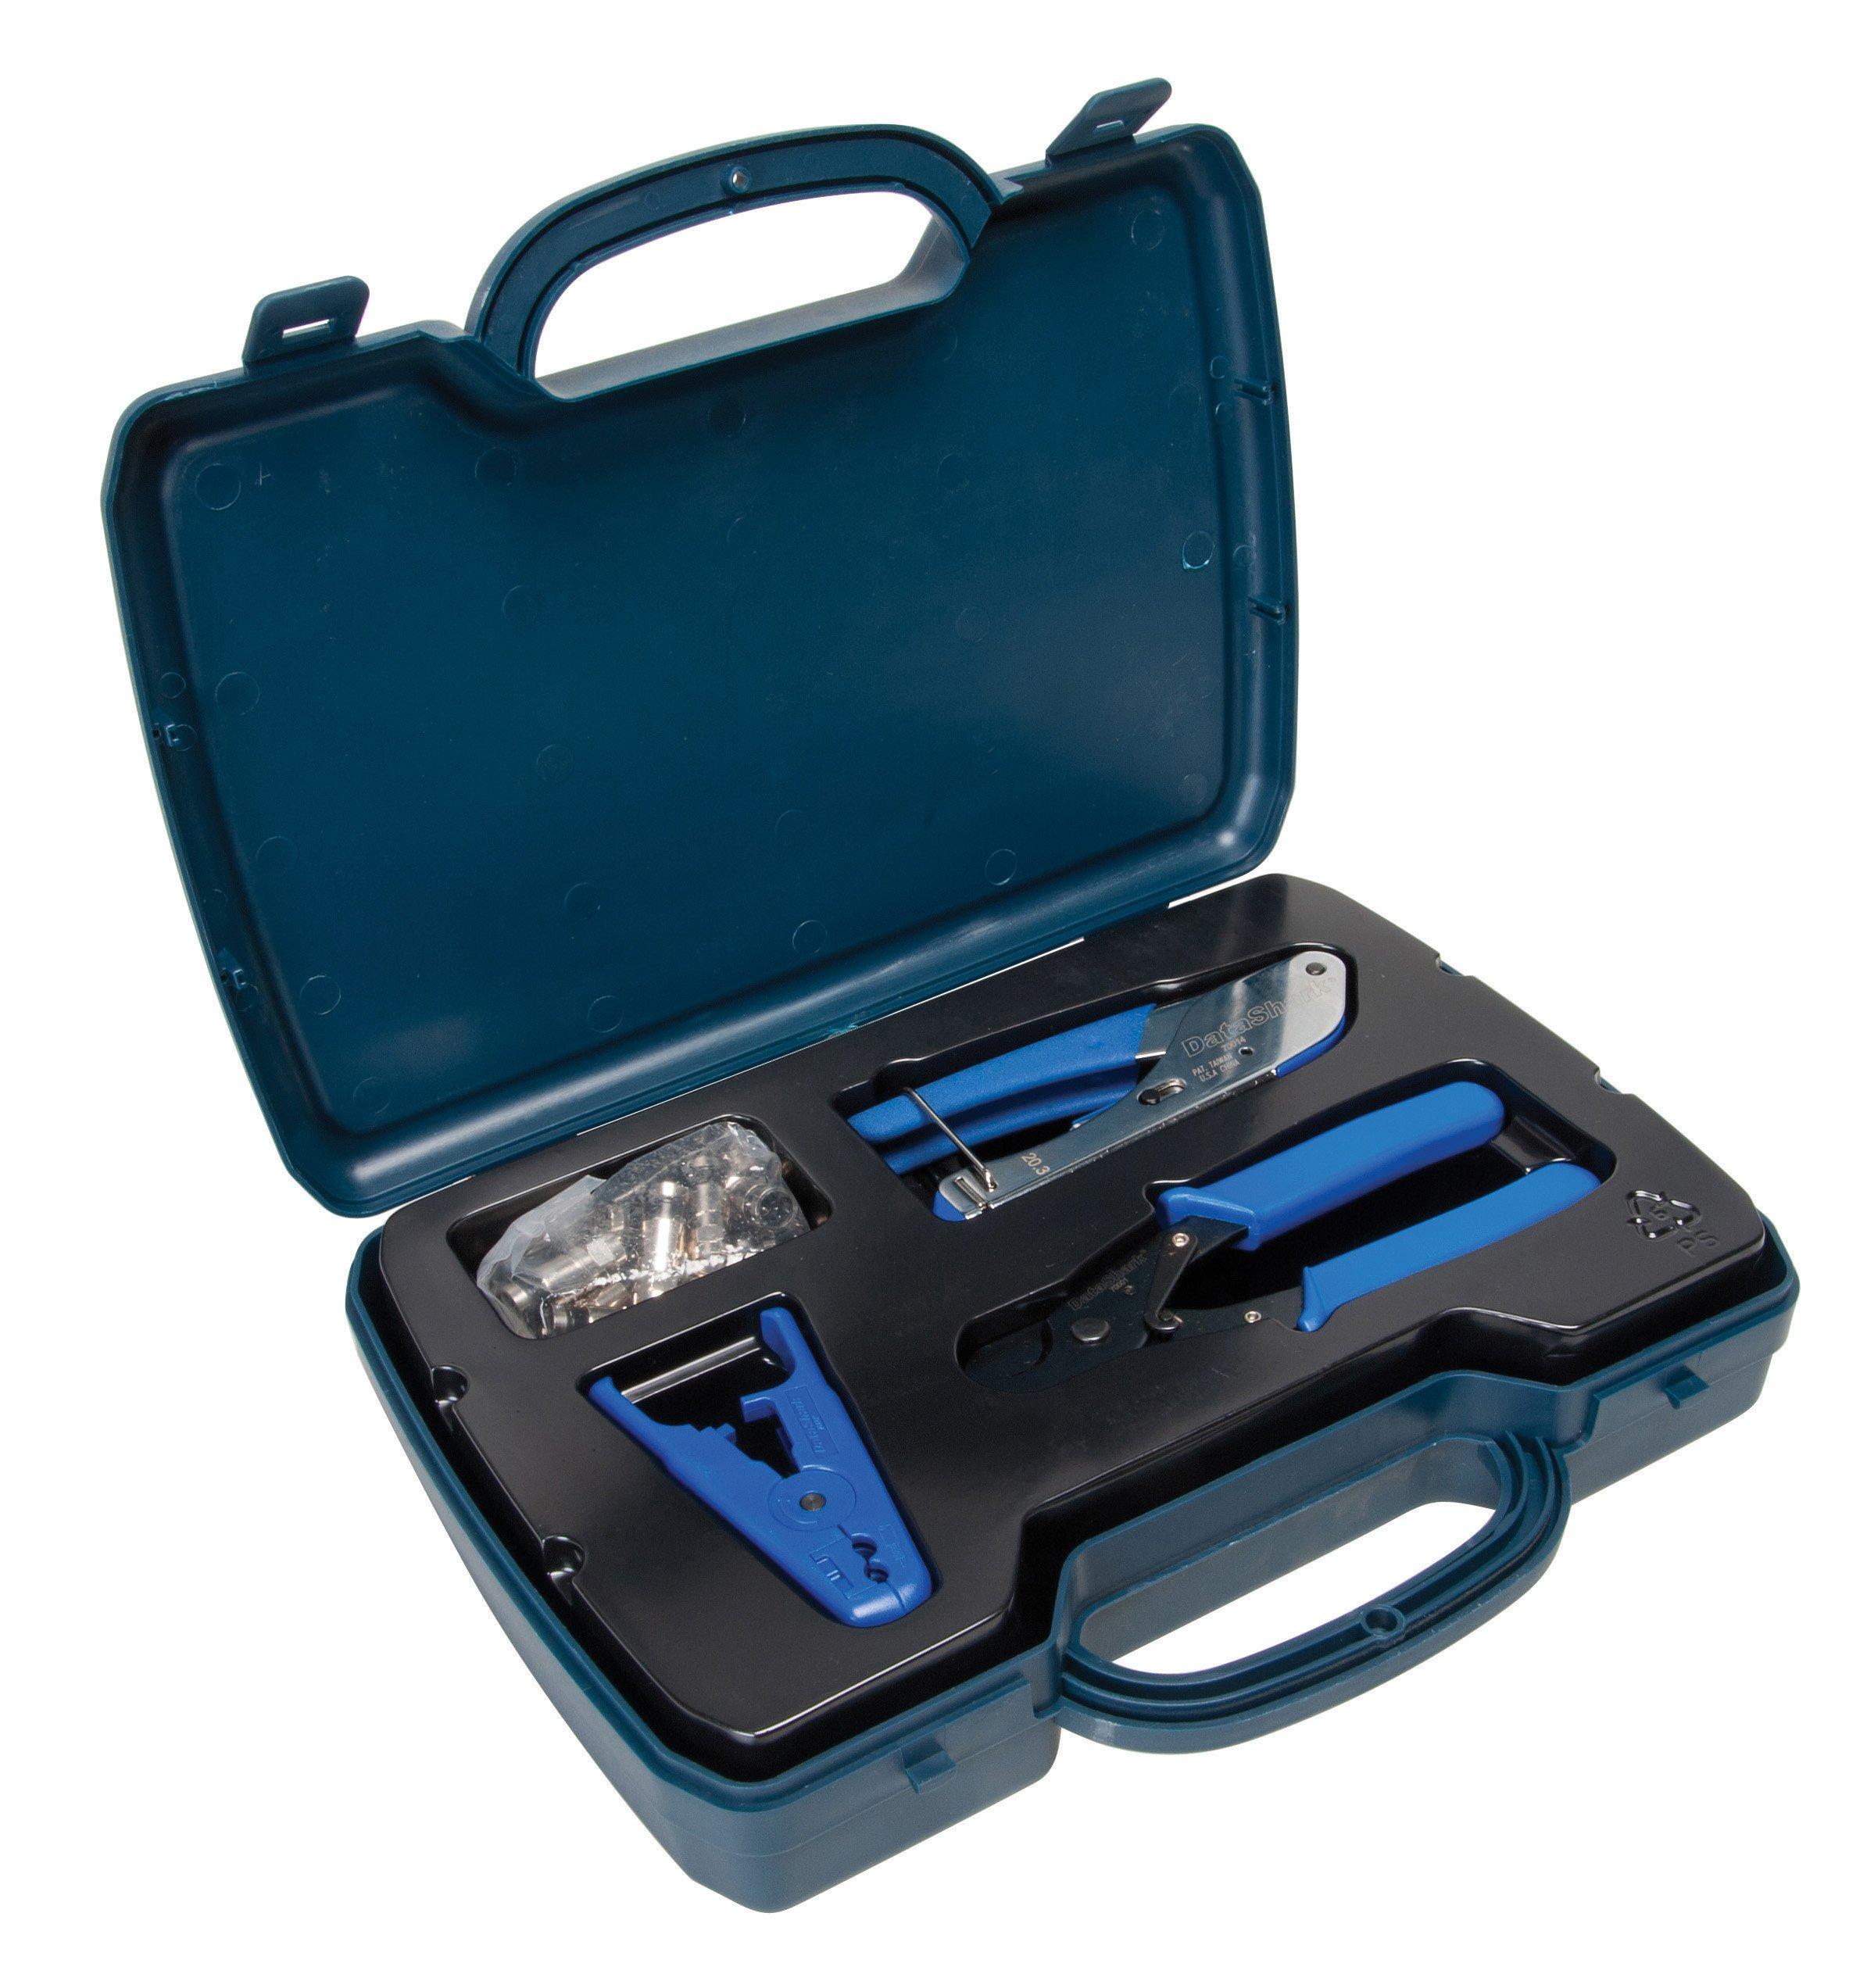 Satellite/catv Tool Kit